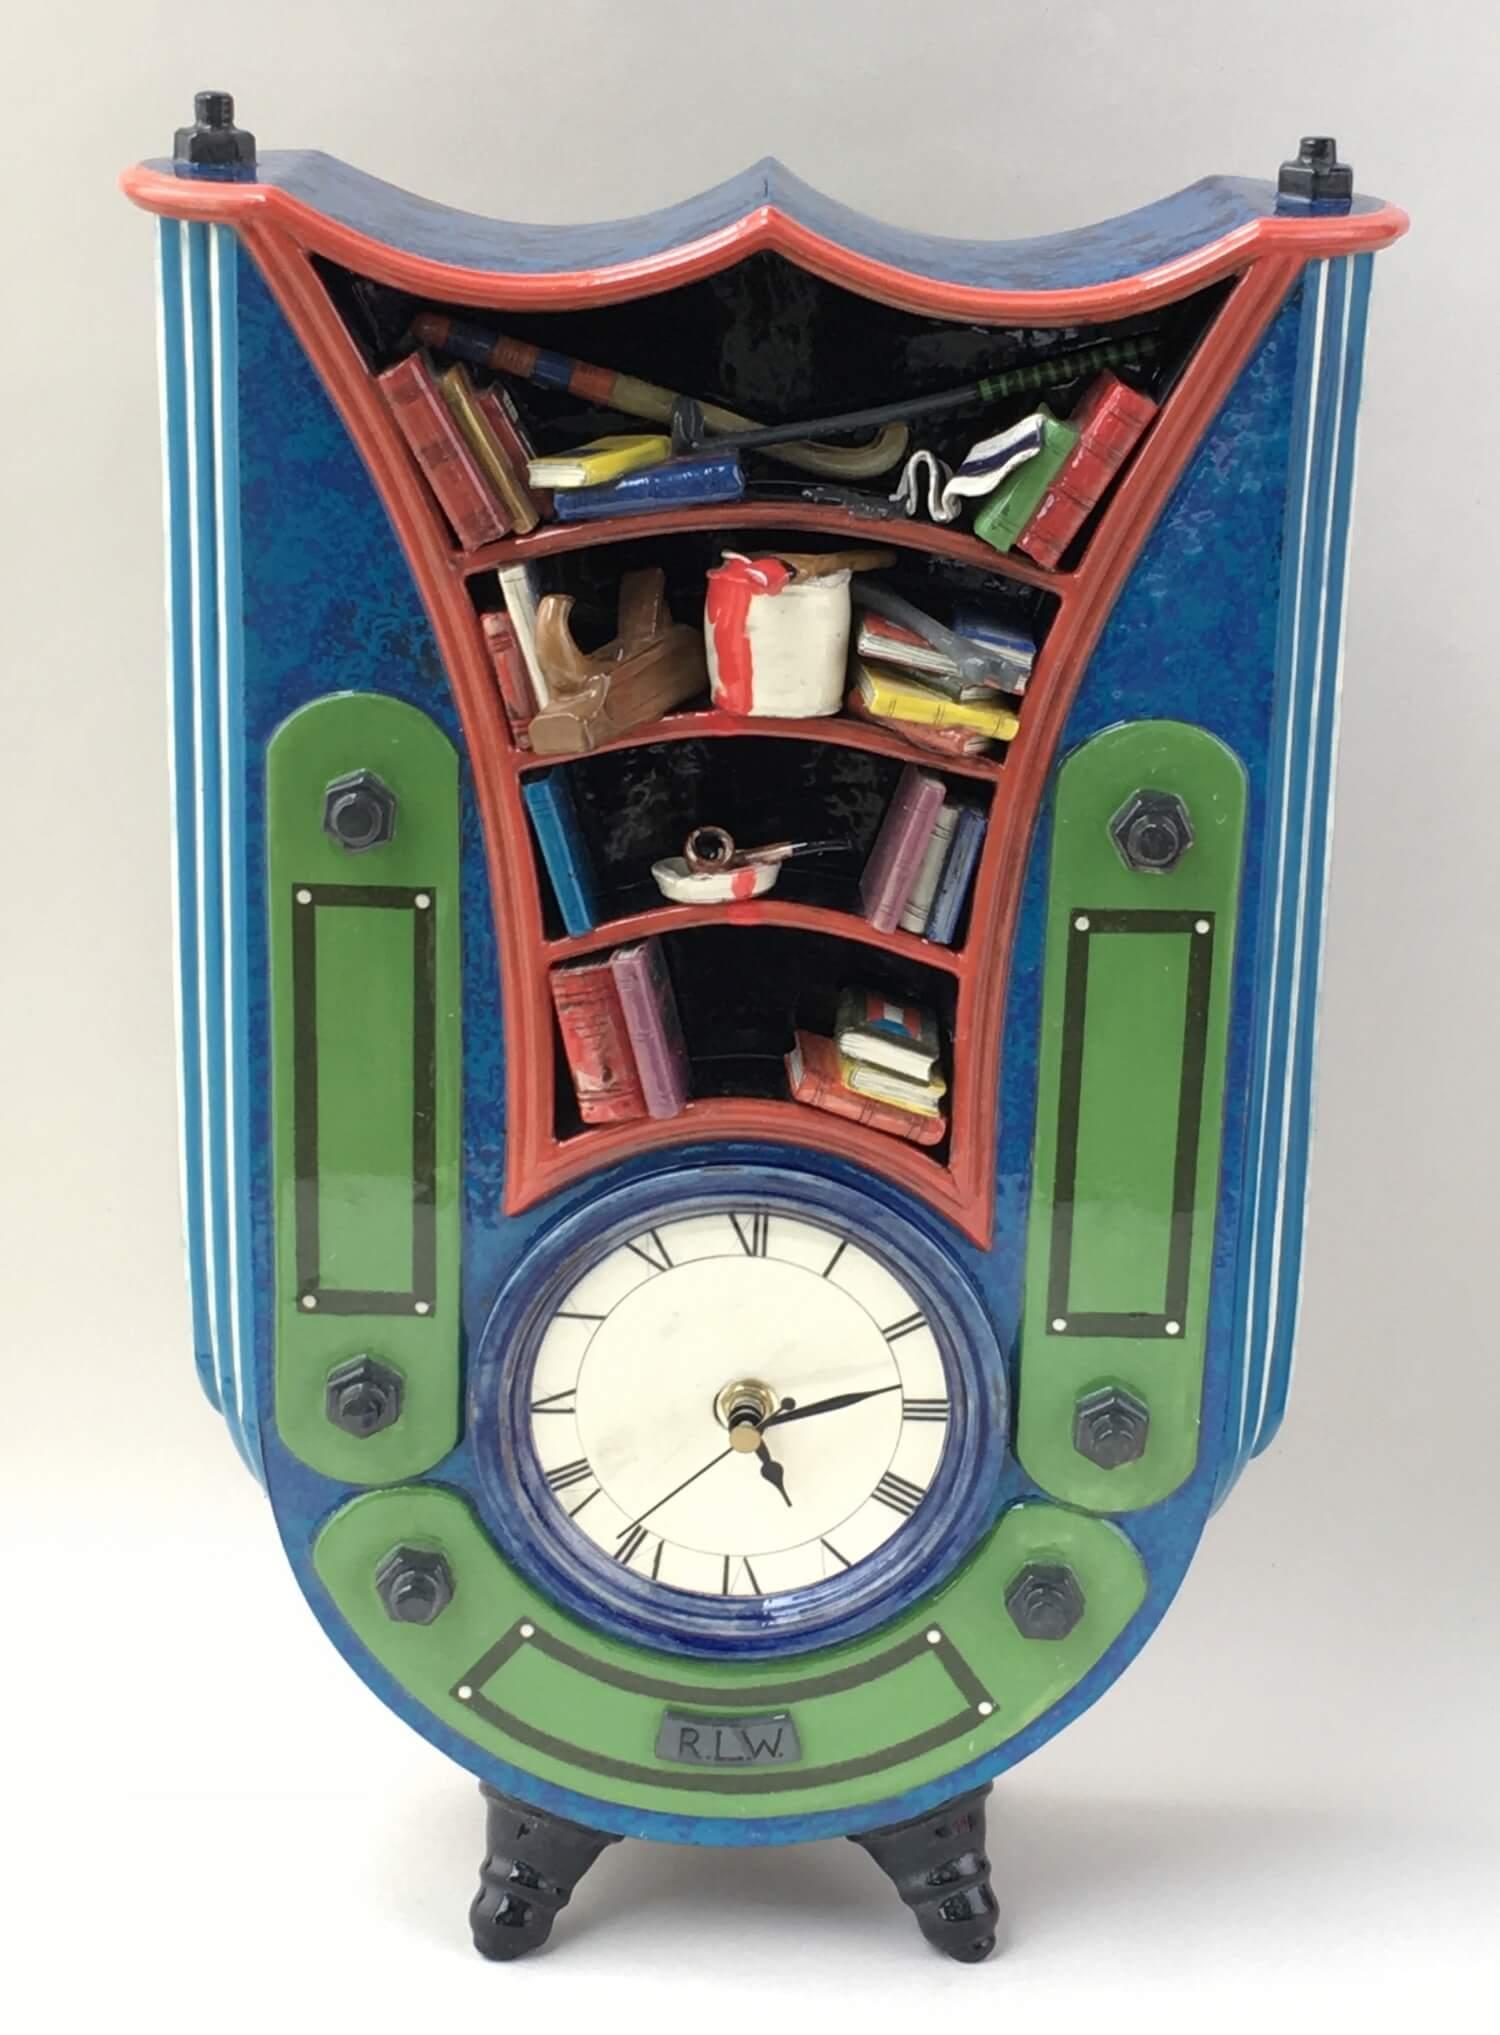 Susies clock